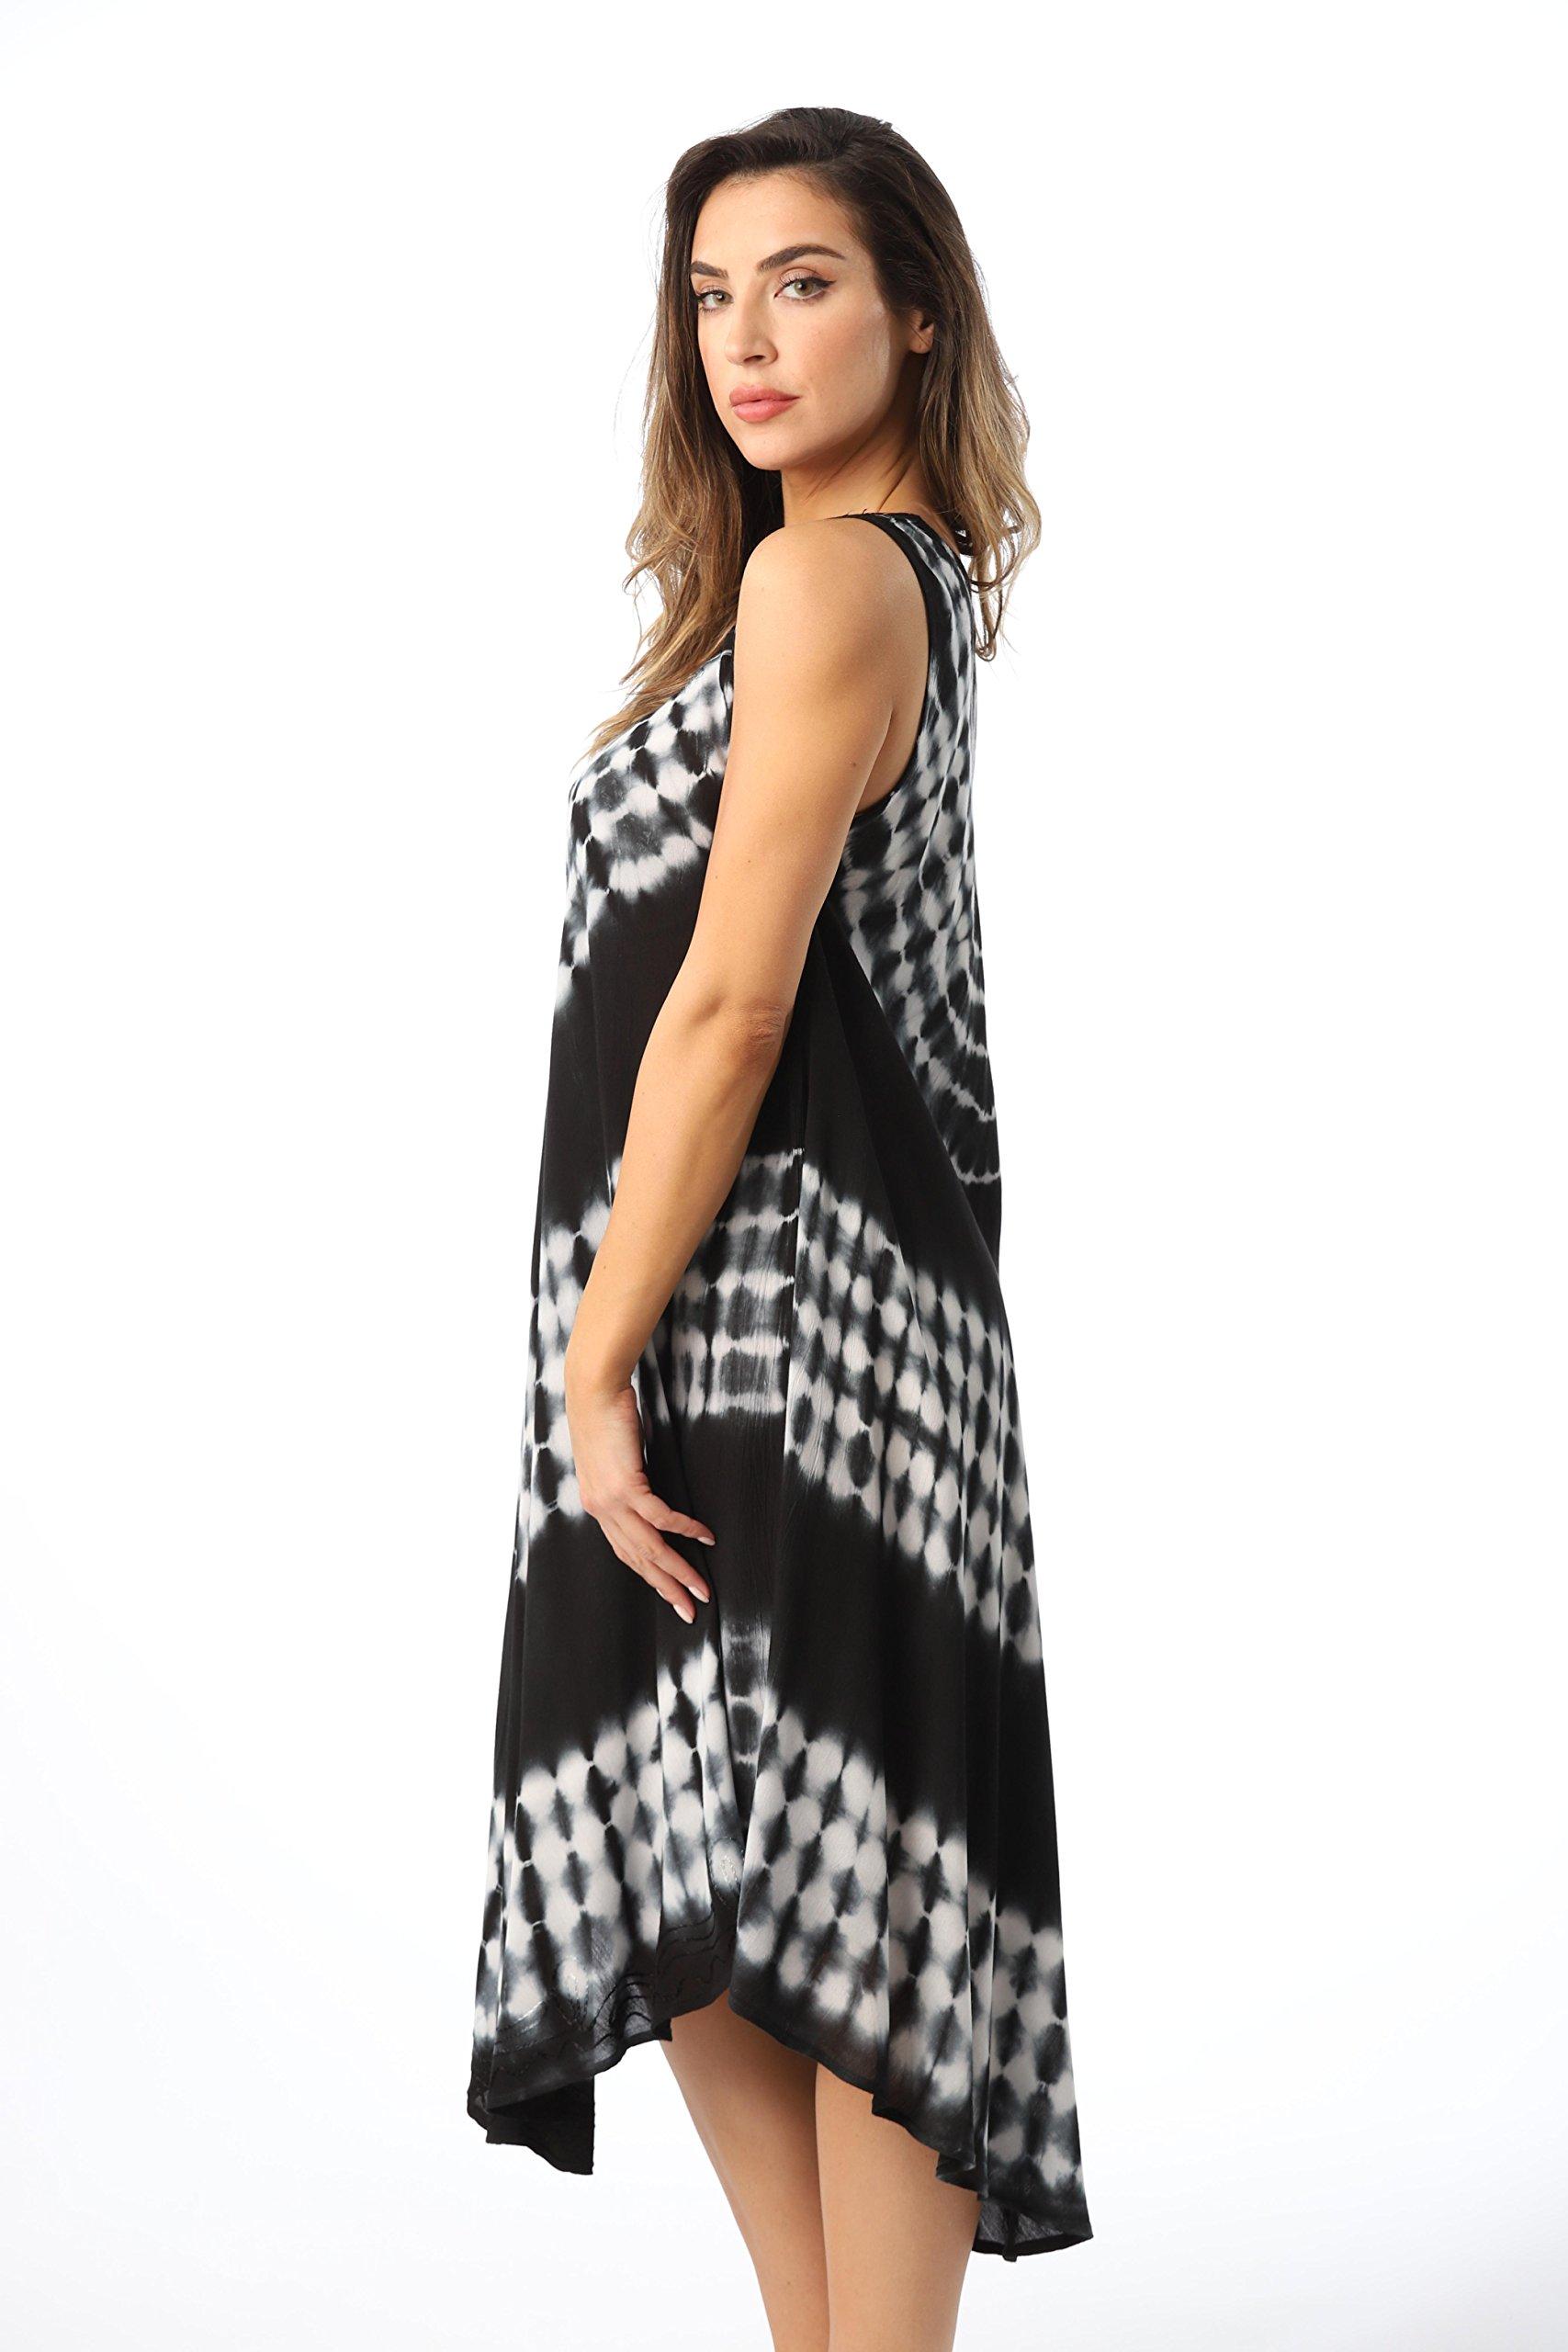 Riviera Sun 21802-BLK-L Dress Dresses For Women by Riviera Sun (Image #3)